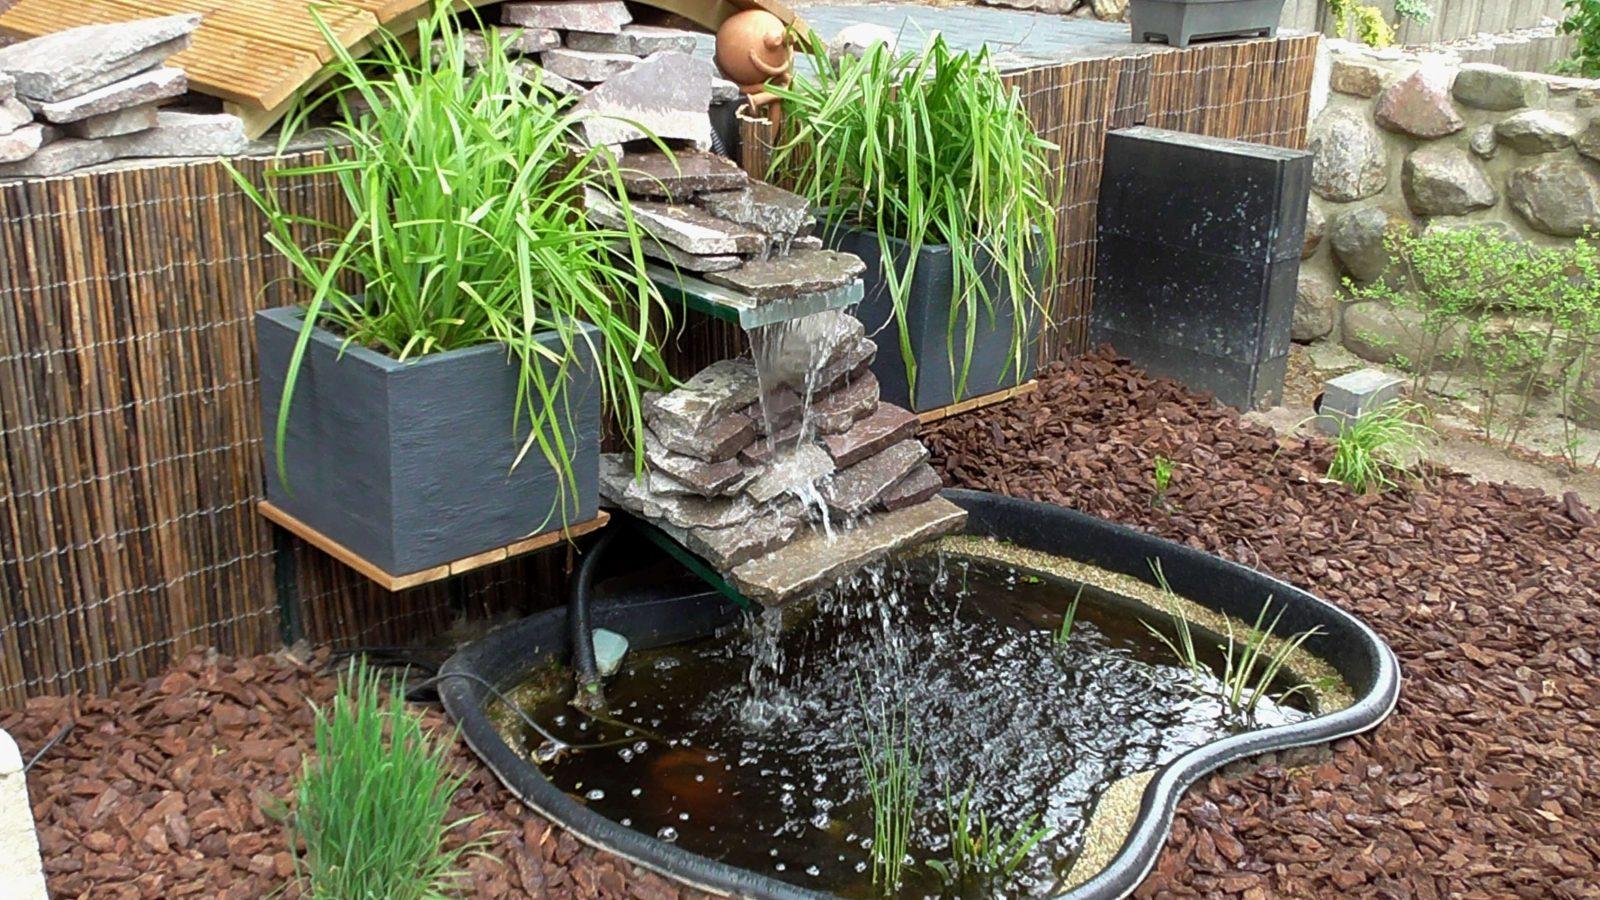 Garten Wasserfall Selber Bauen Reizend Bachlauf Selber Anlegen Probe von Wasserfall Gartenteich Selber Bauen Photo